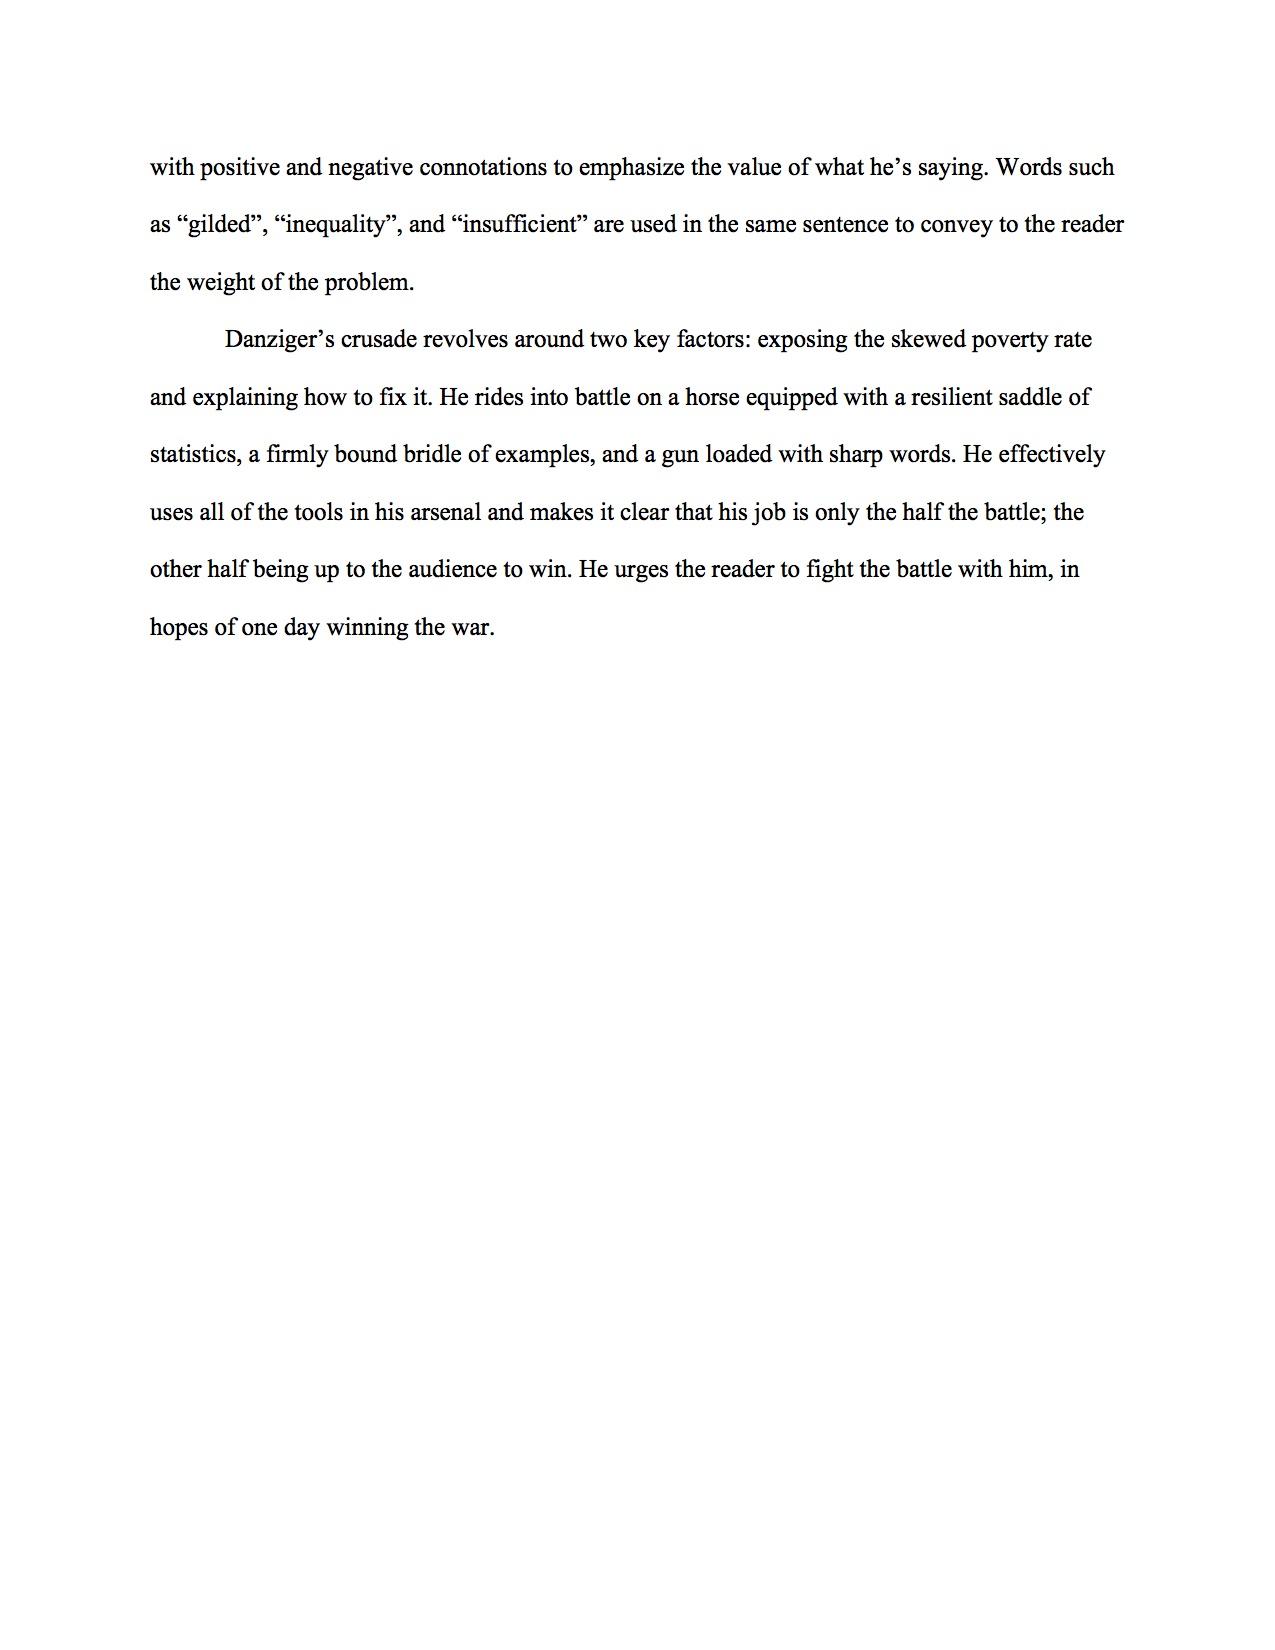 003 Op Essay Example Page Wonderful Ed Paper Examples Op-ed Sample Full